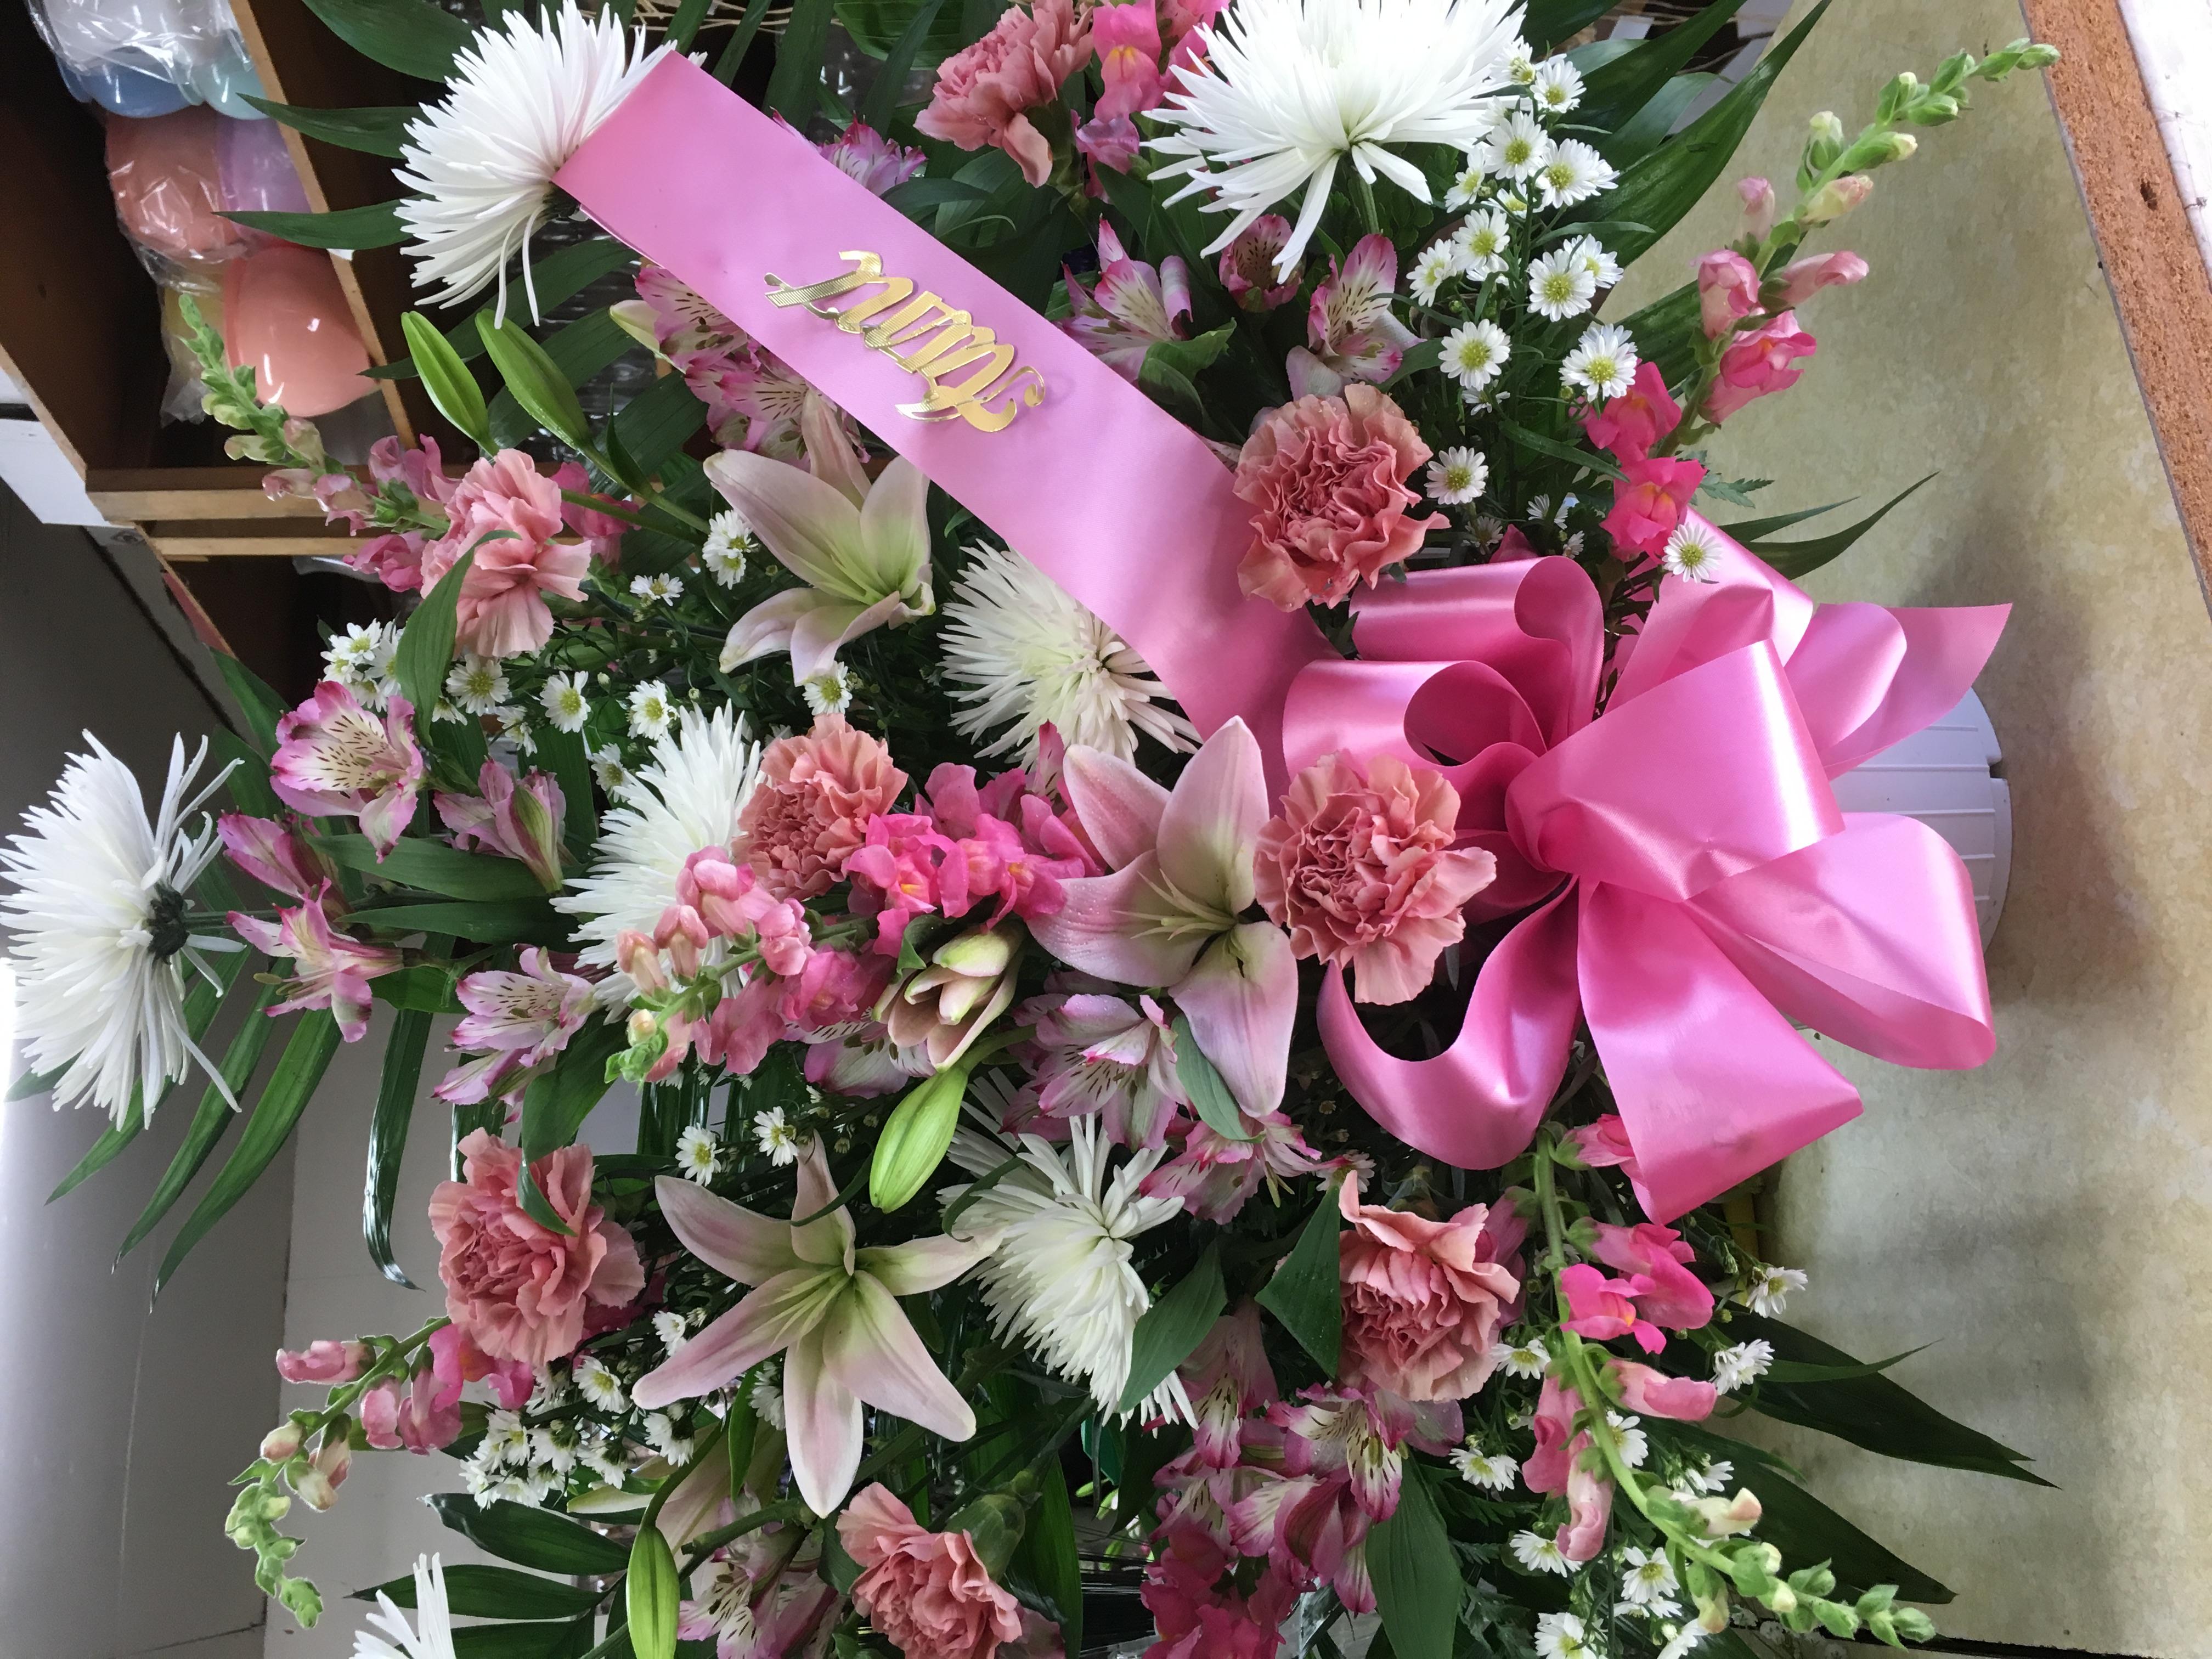 Shades Of Pink Funeral Basket Bristol Pa Florist